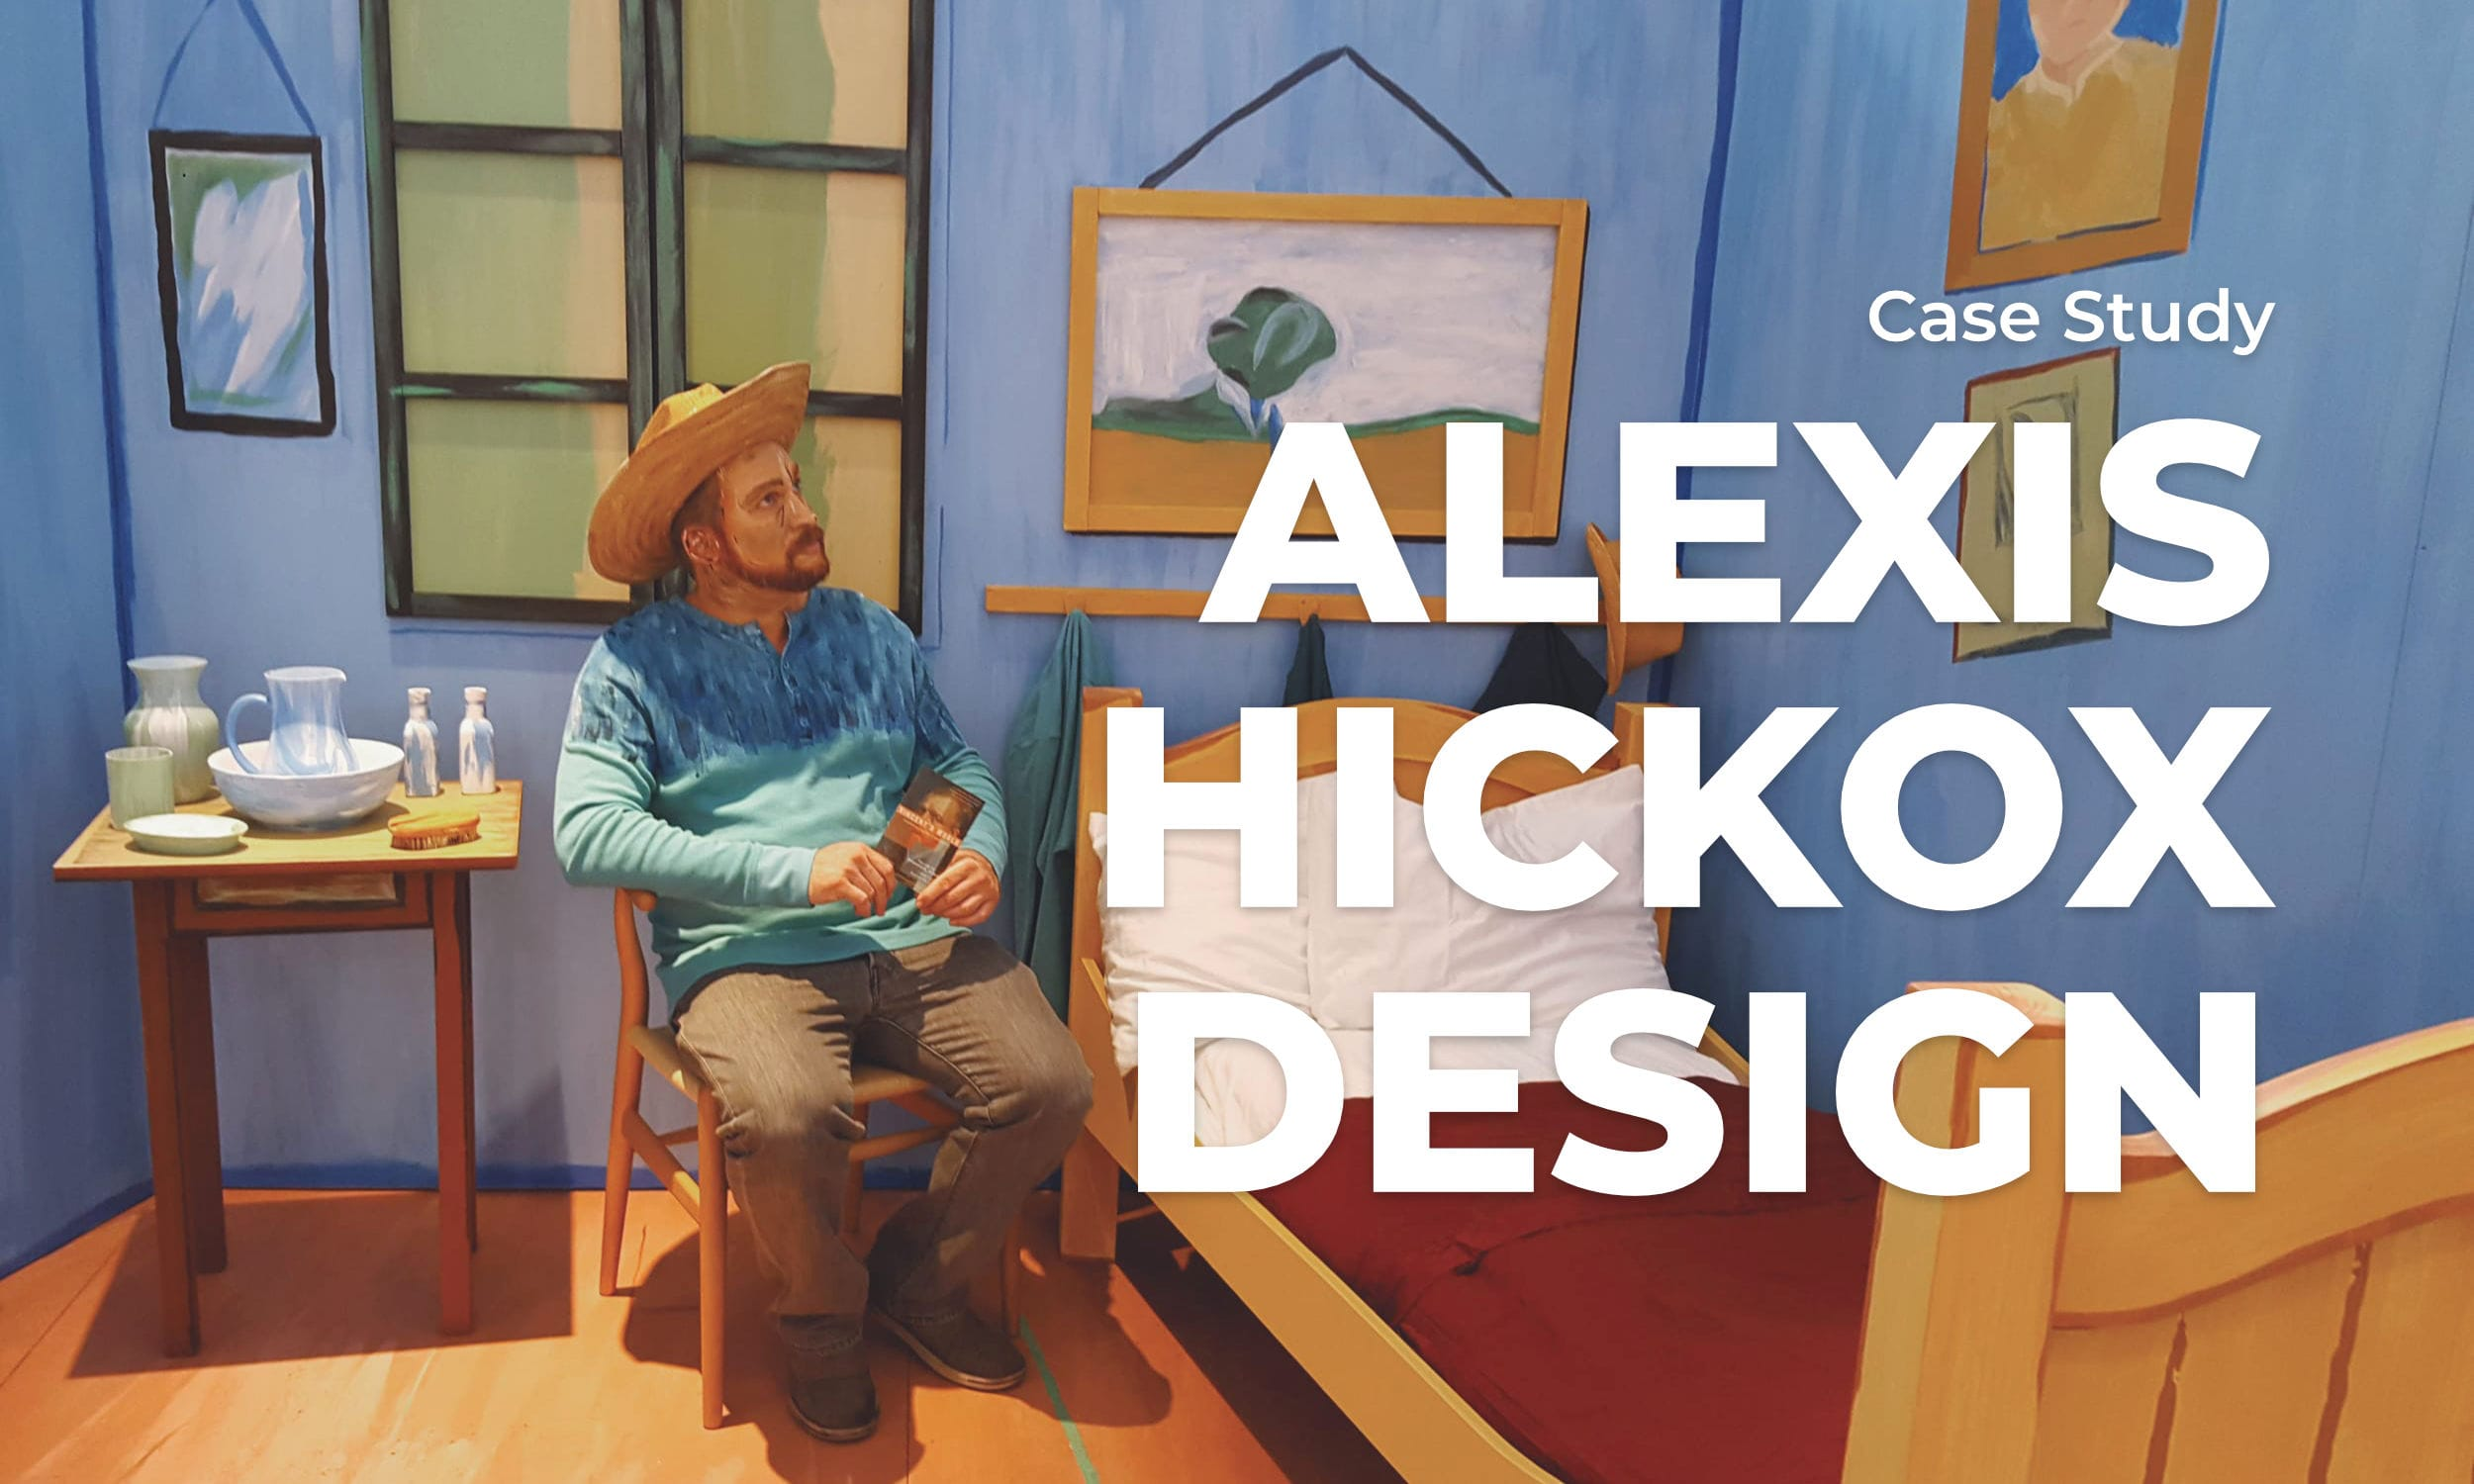 Case Study - Alexis Hickox Design.jpg